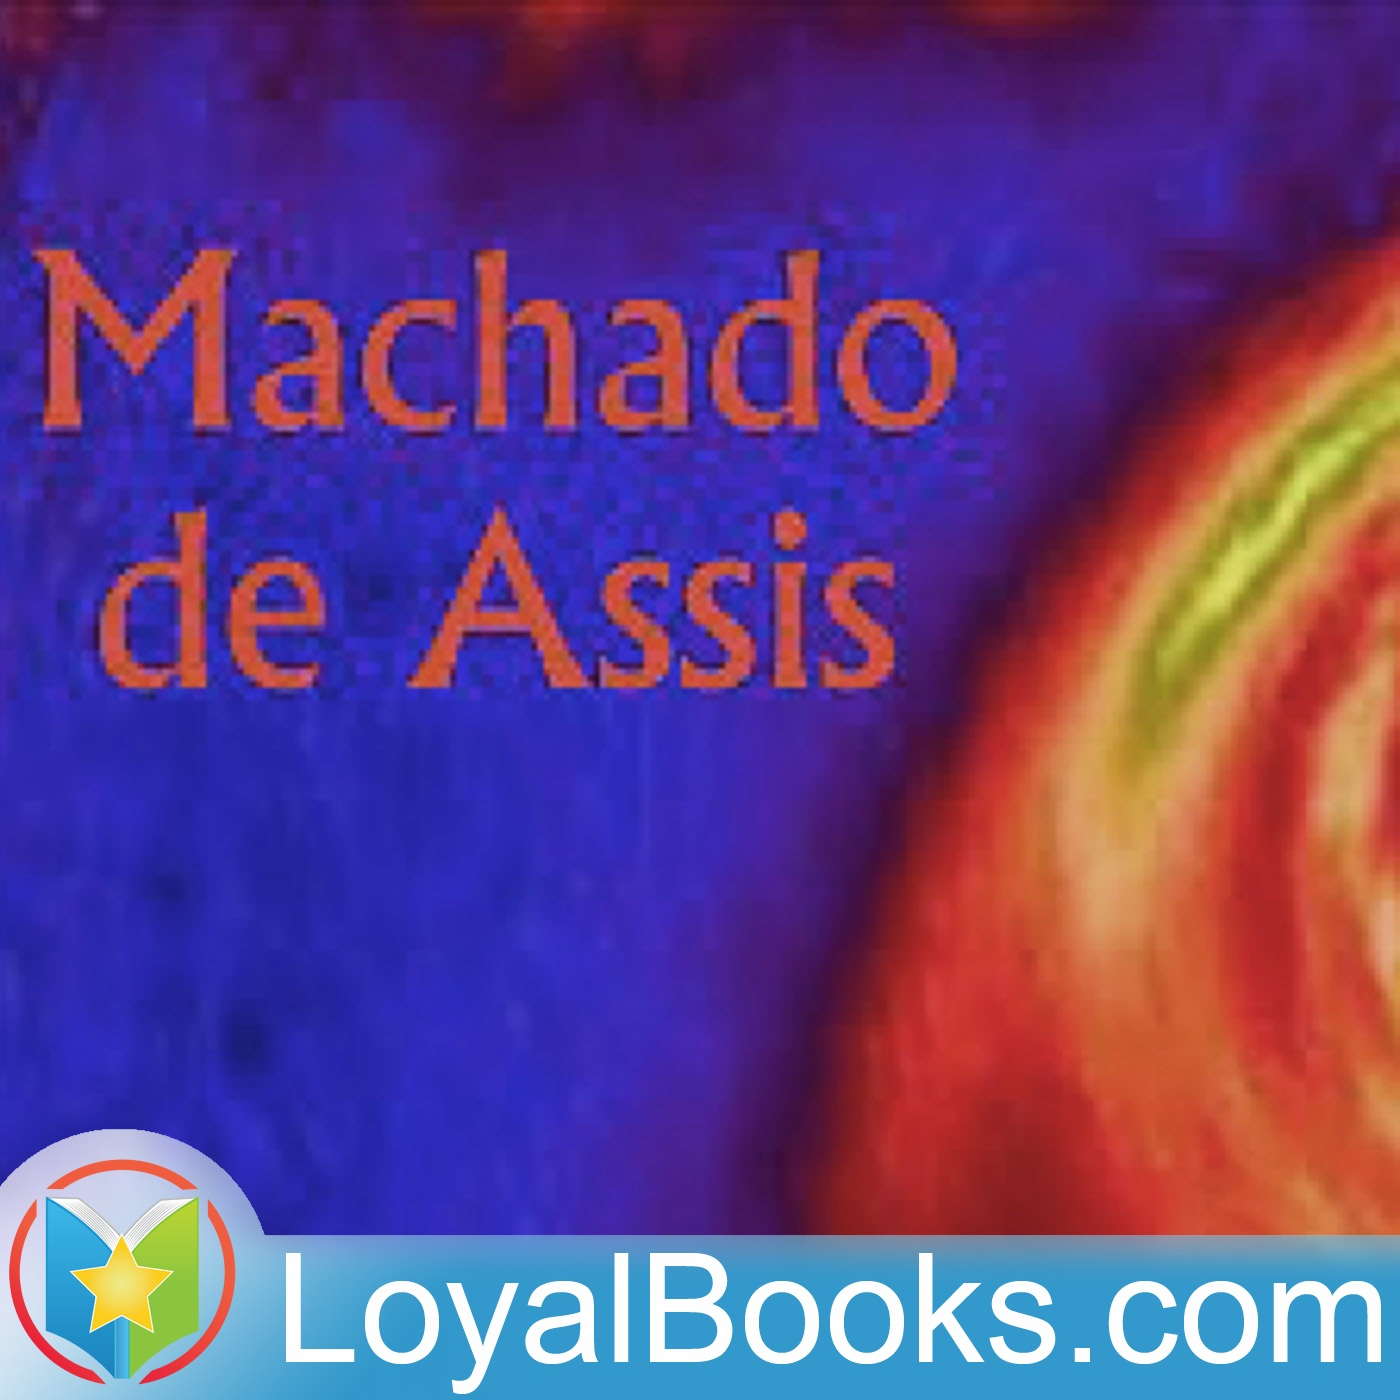 <![CDATA[O Alienista by Machado de Assis]]>